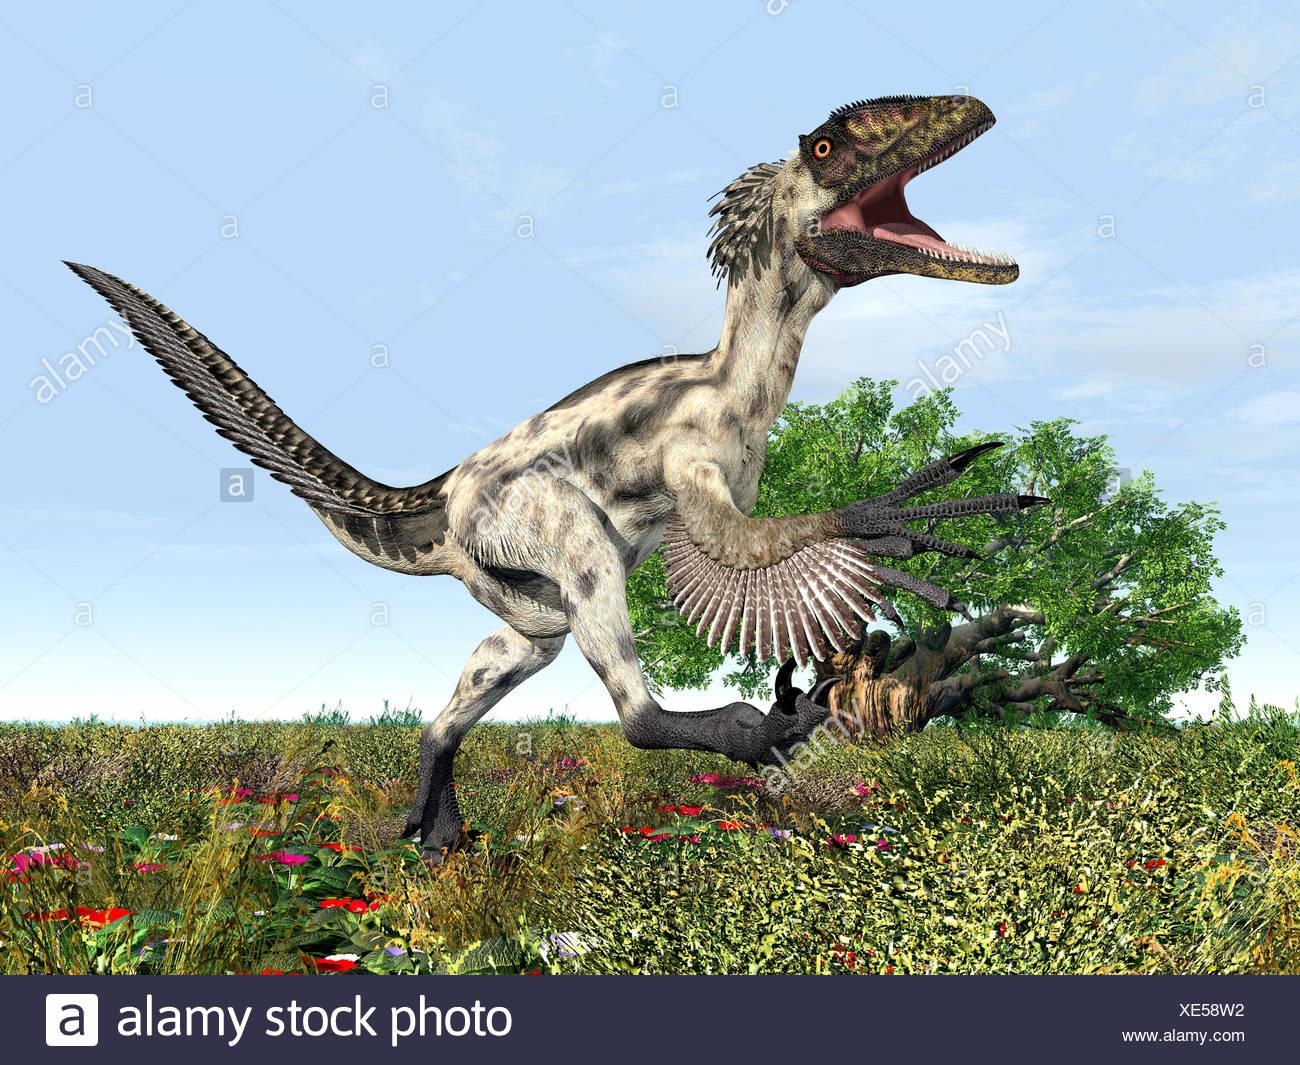 dinosaur deinonychus - Stock Image